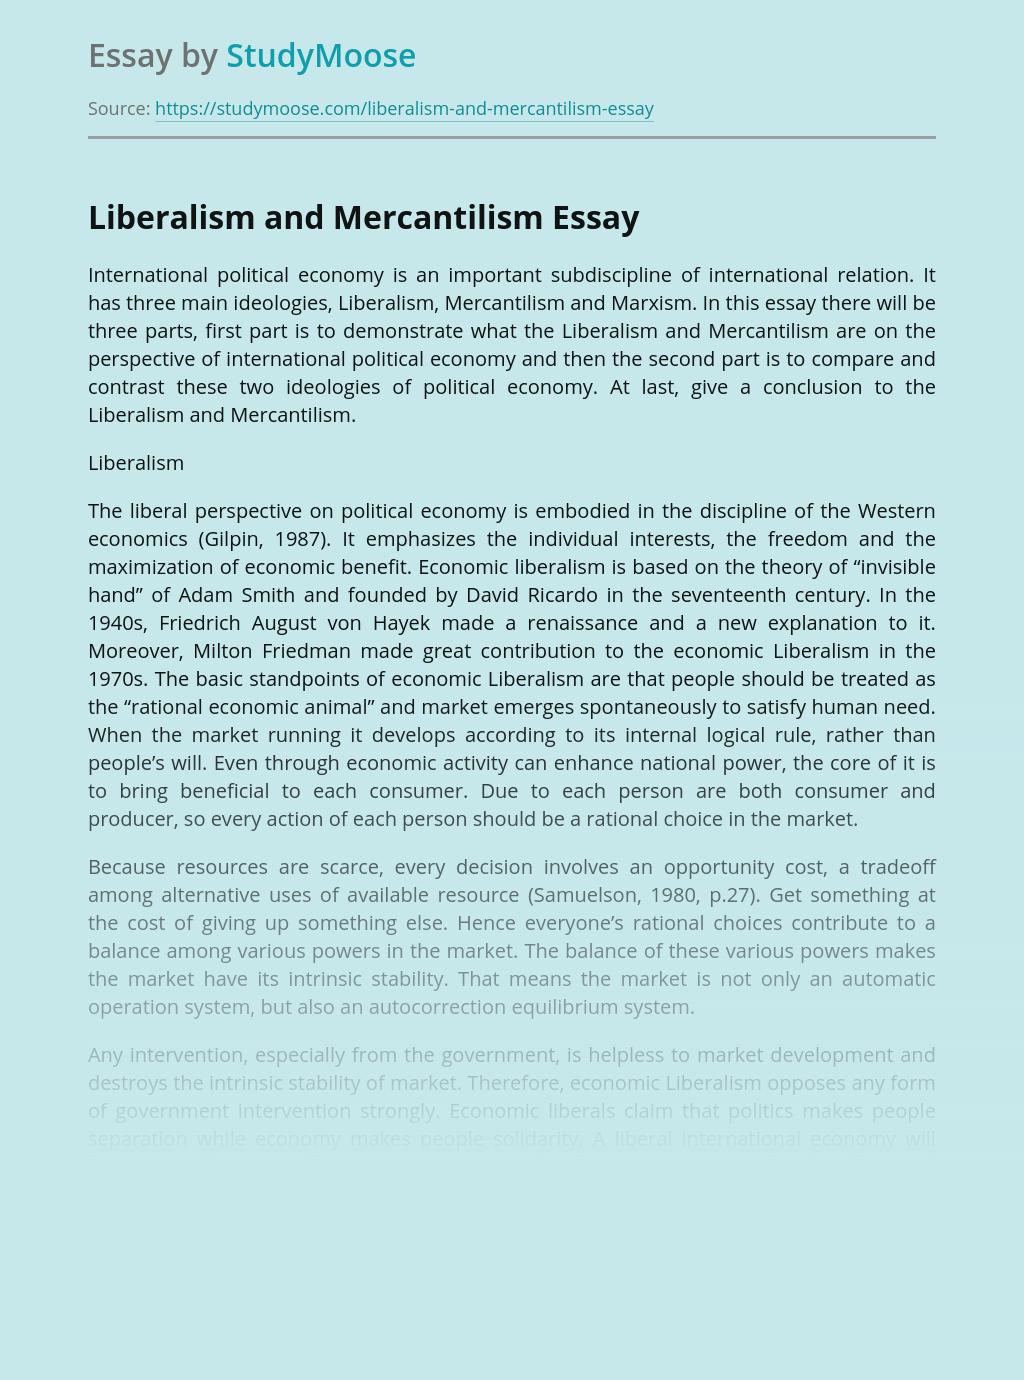 Liberalism and Mercantilism